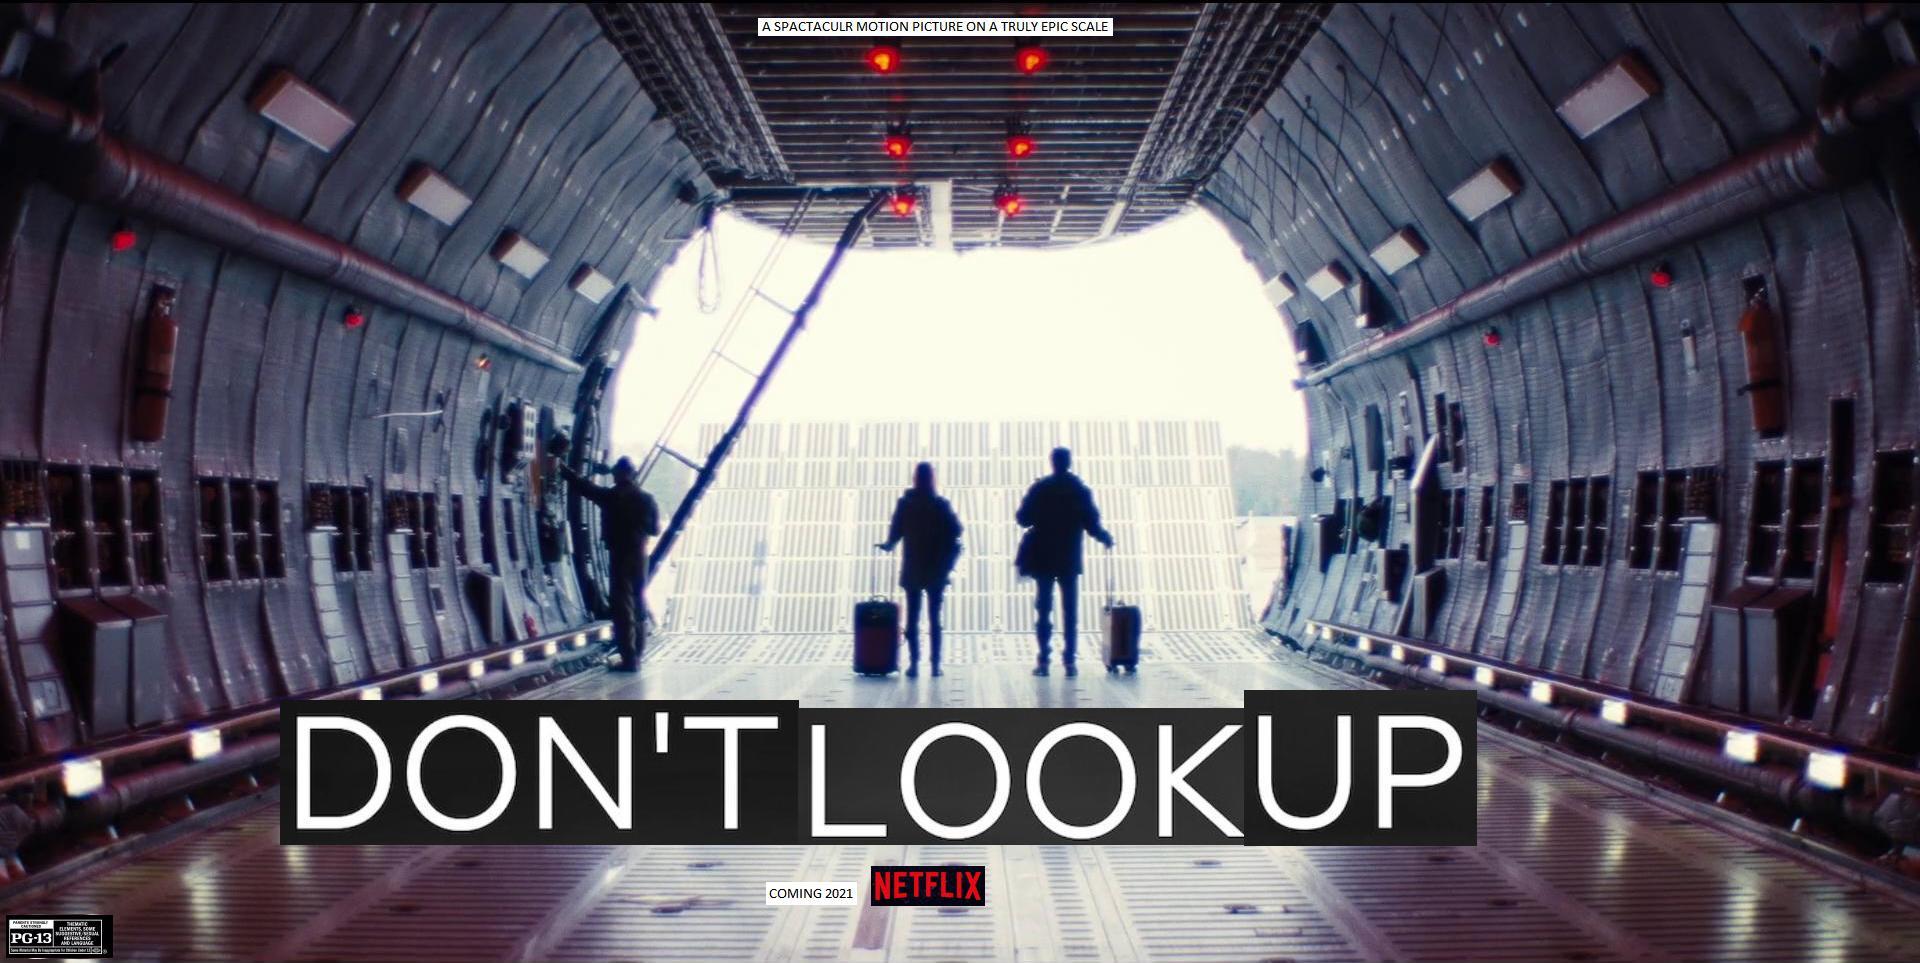 Phim viễn tưởng Don't look up.